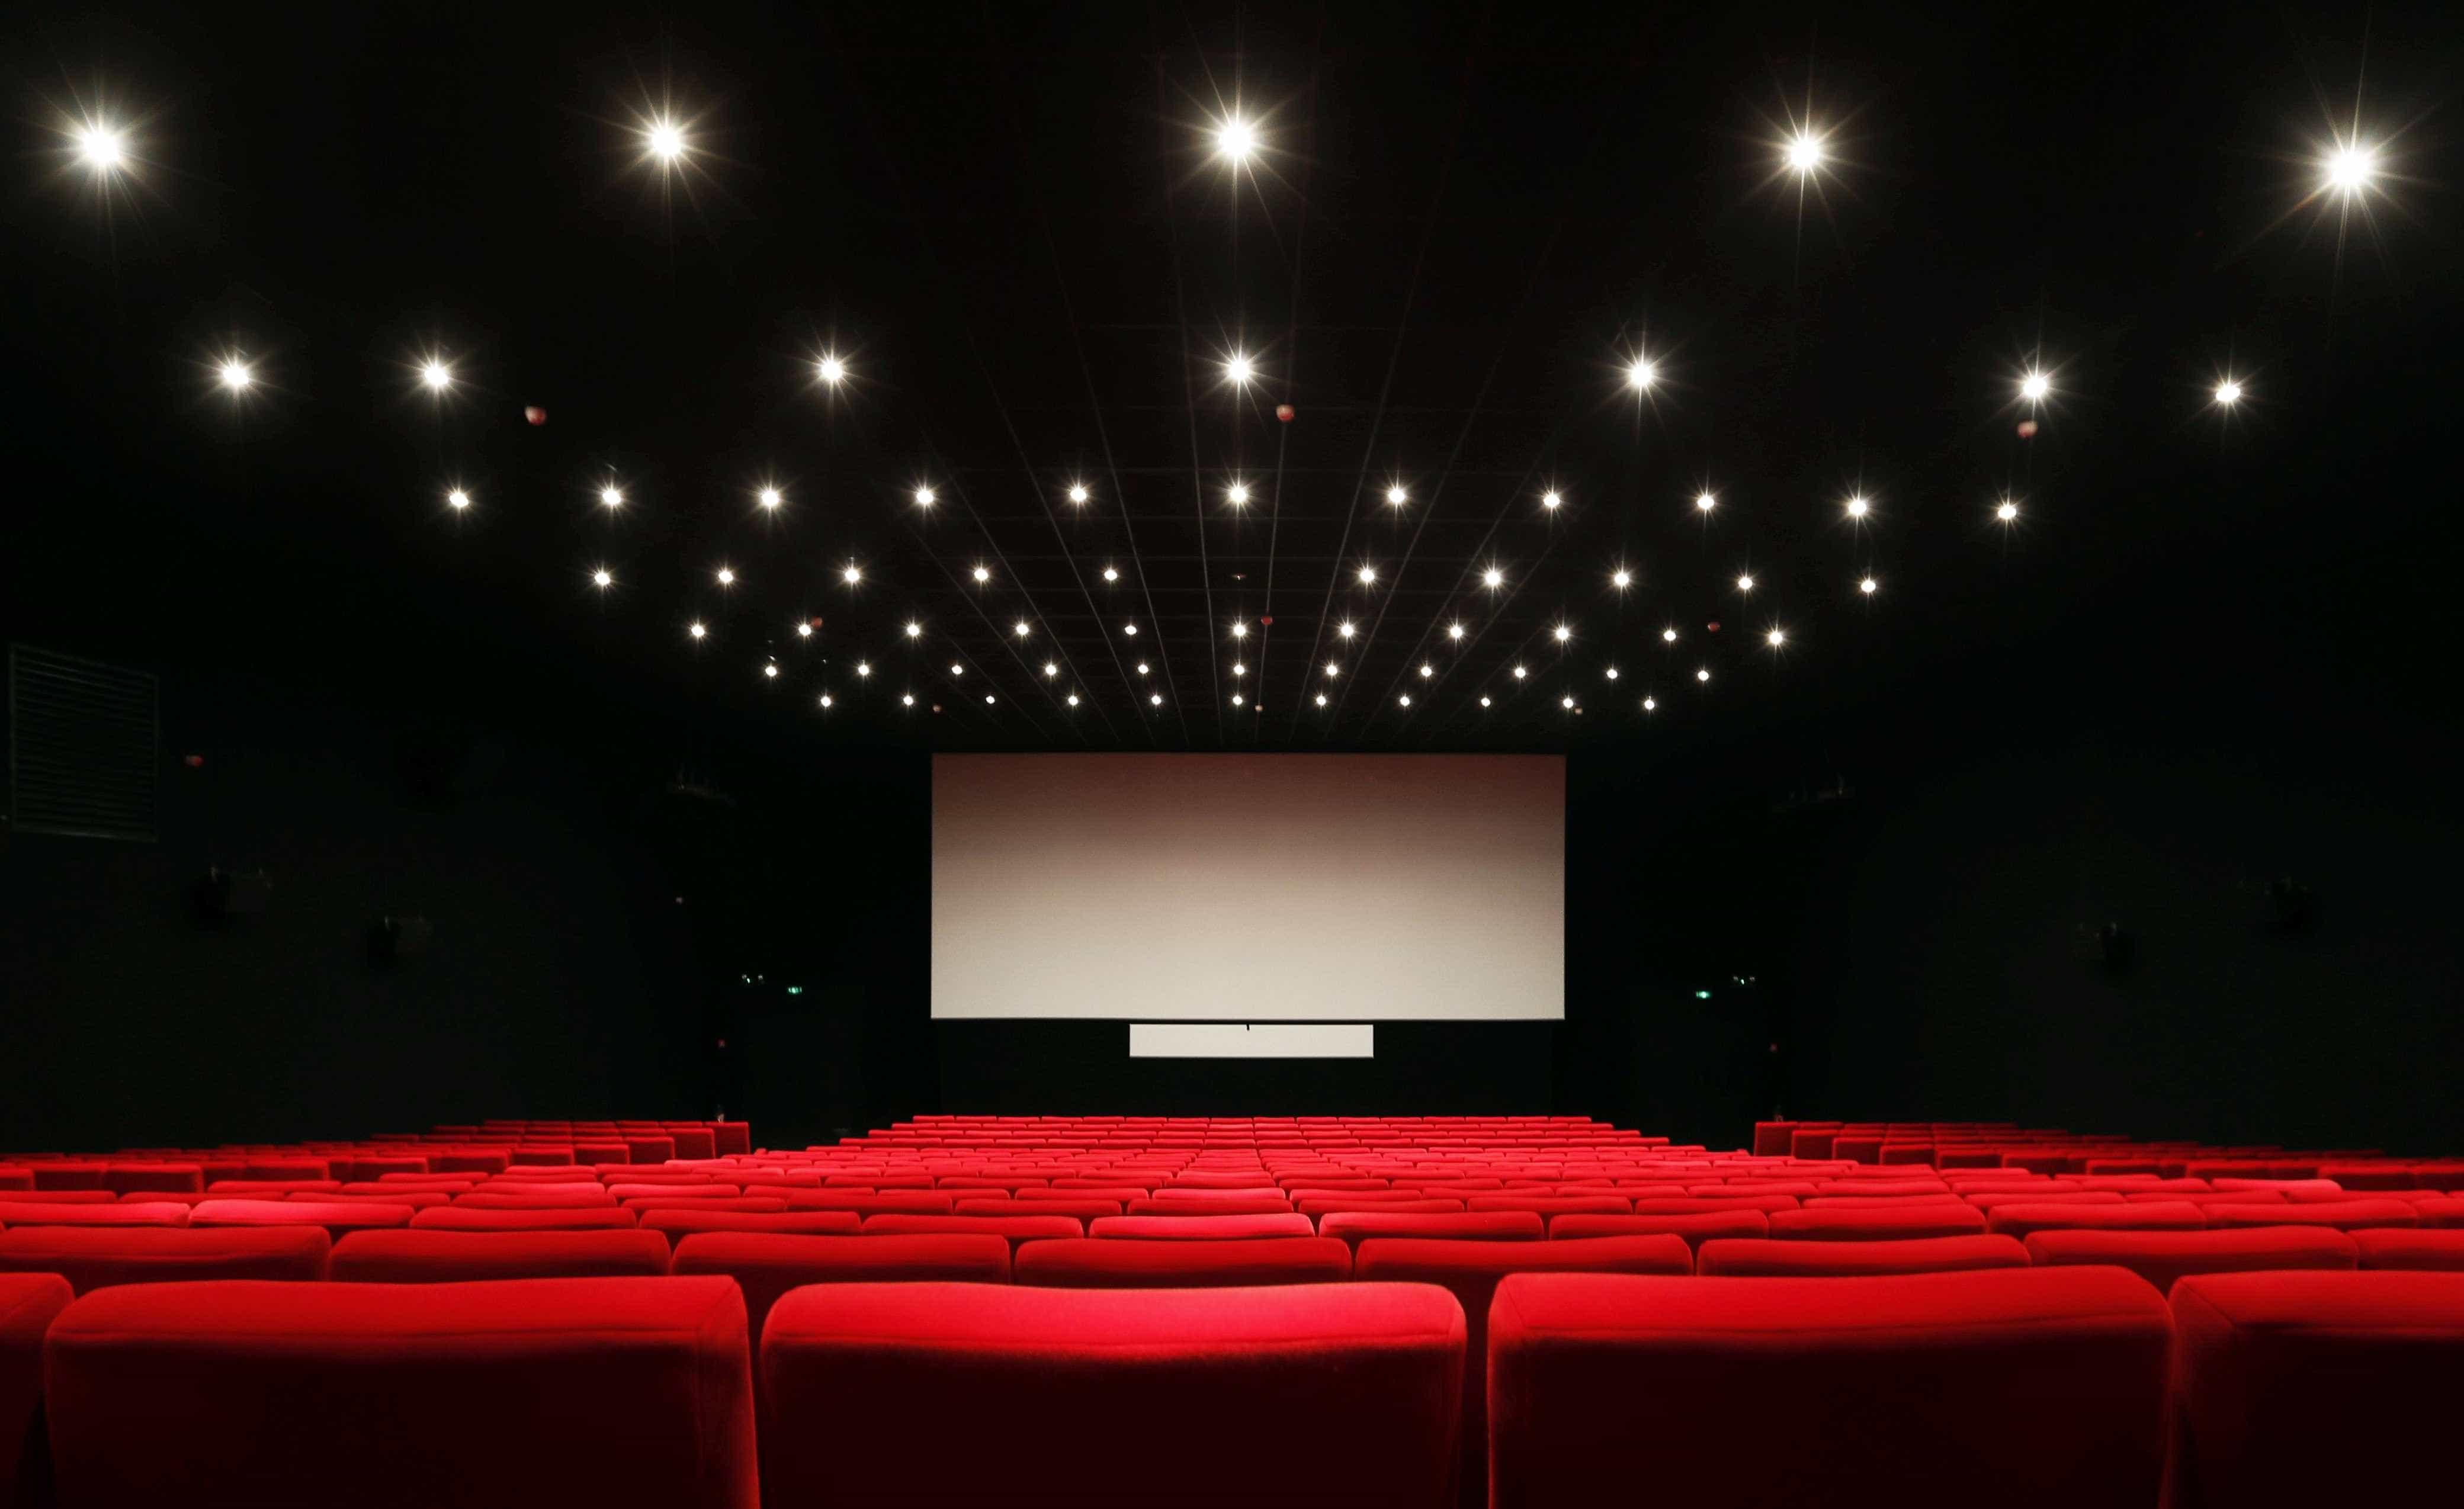 Catorze filmes, dois deles nacionais, no Porto/Post/Doc 2018